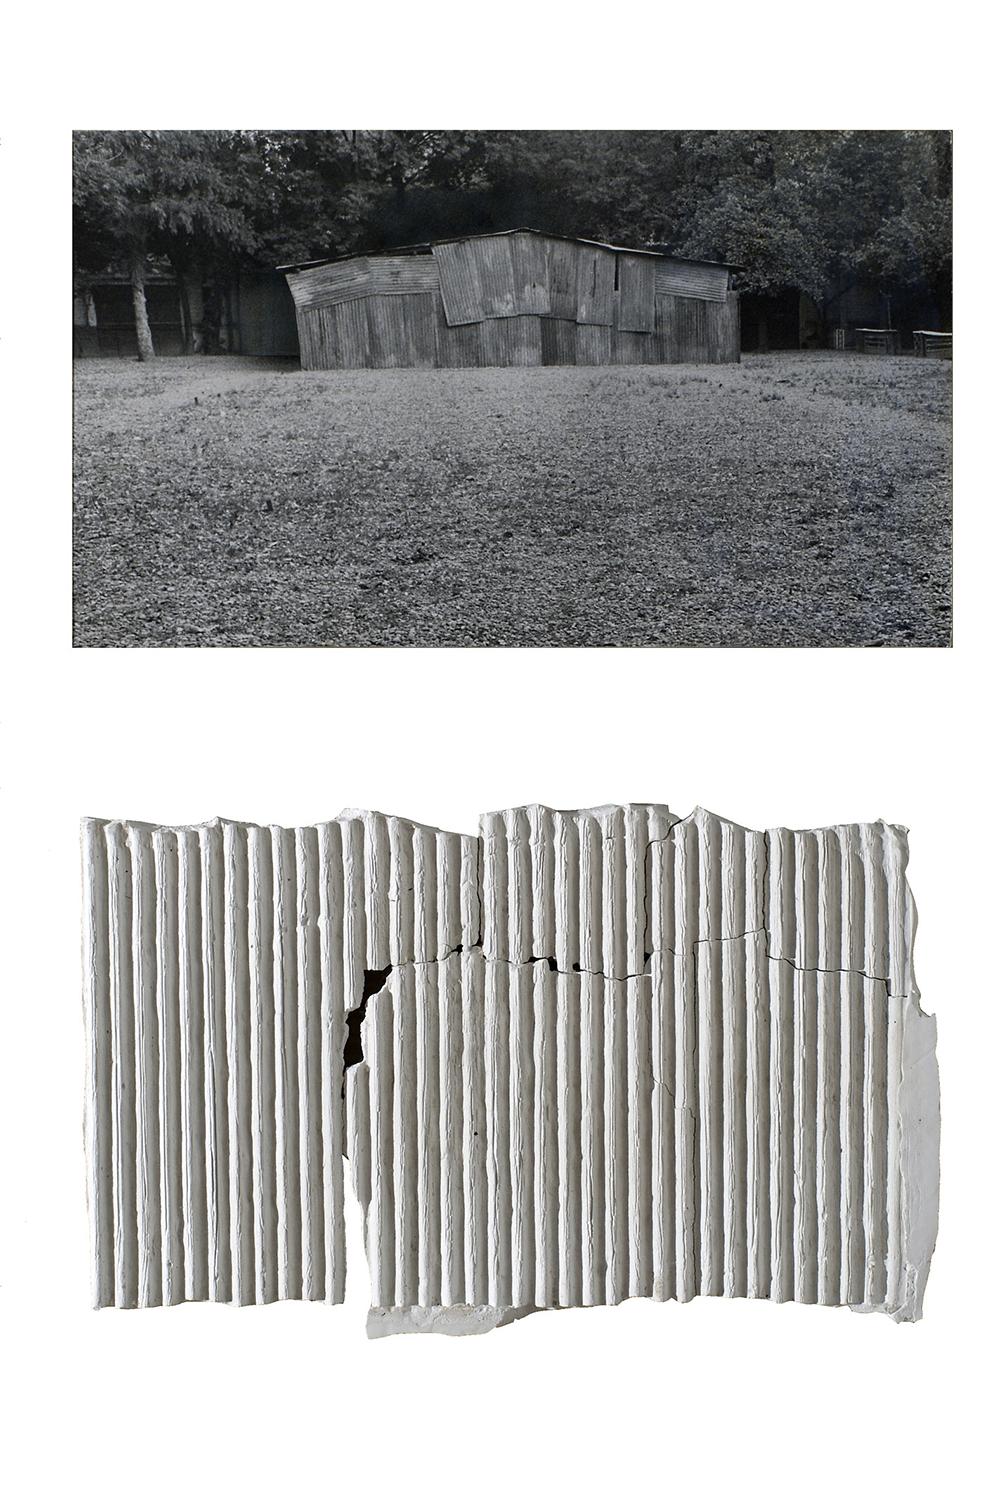 Archeologia, 1973, stampa ai sali d'argento e scagliola, cm 40x30